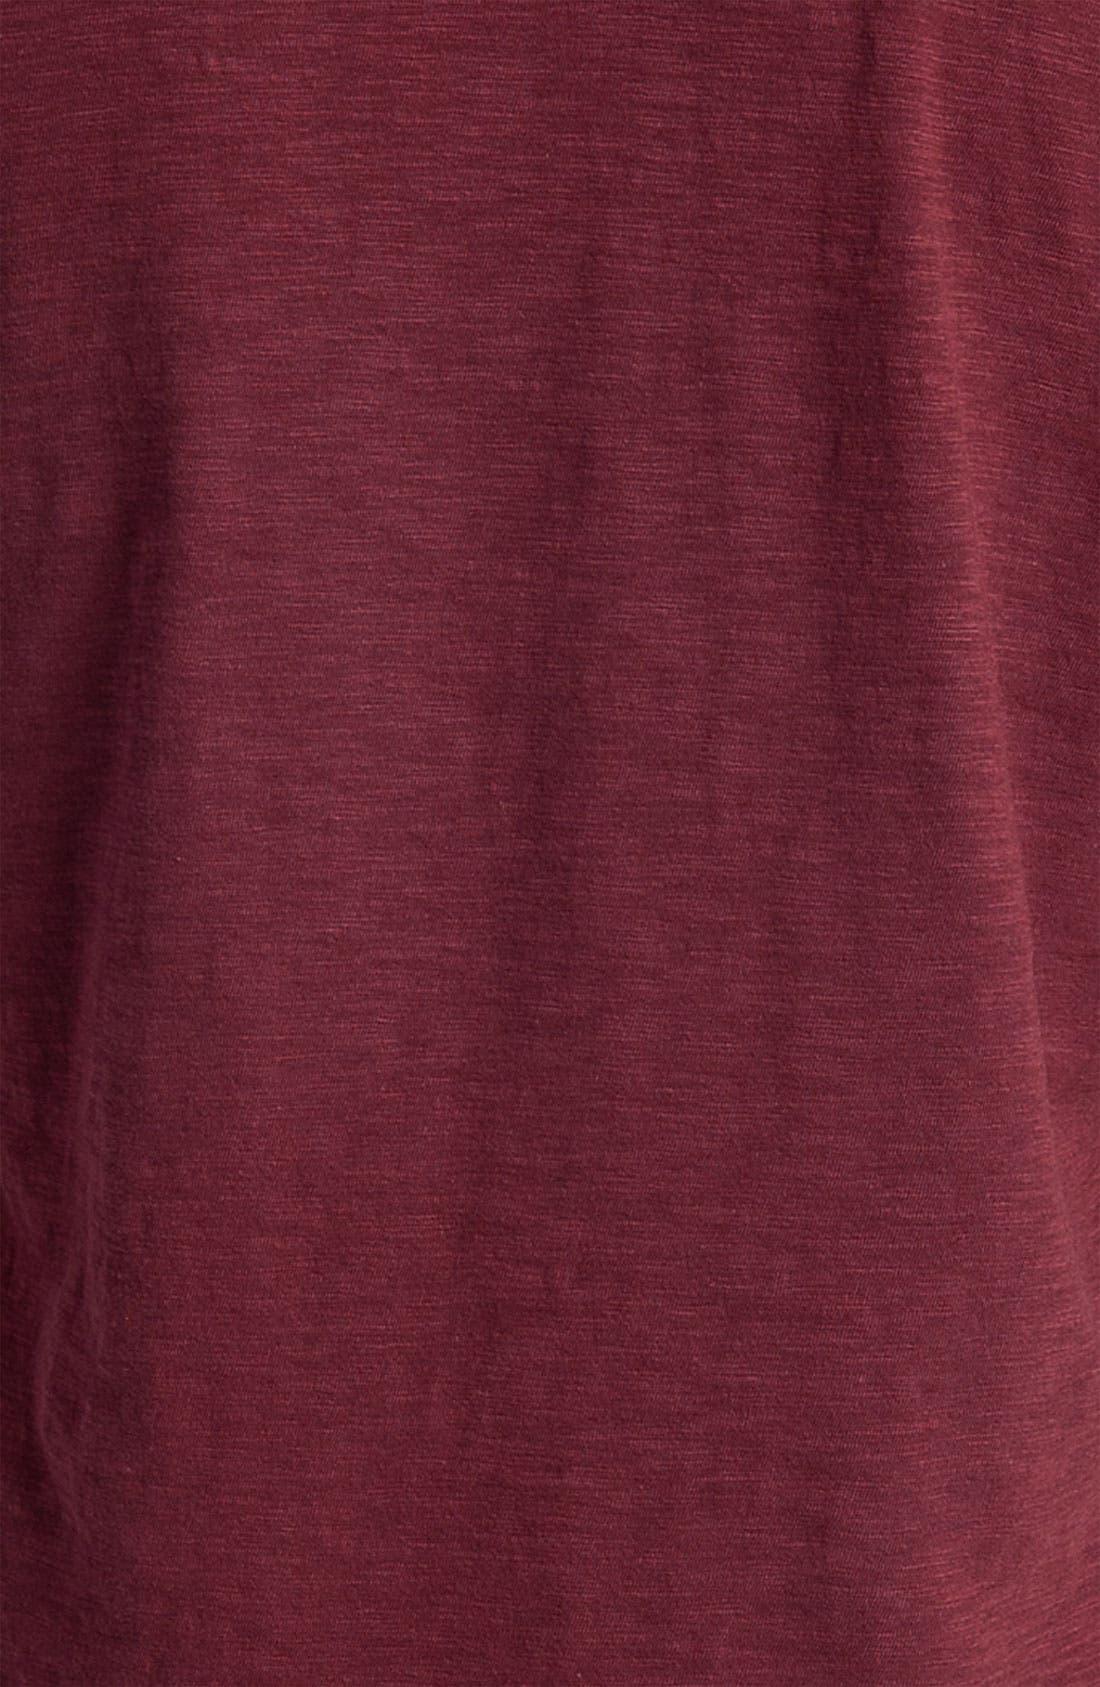 'Chicago Cubs' Regular Fit Crewneck T-Shirt,                             Alternate thumbnail 50, color,